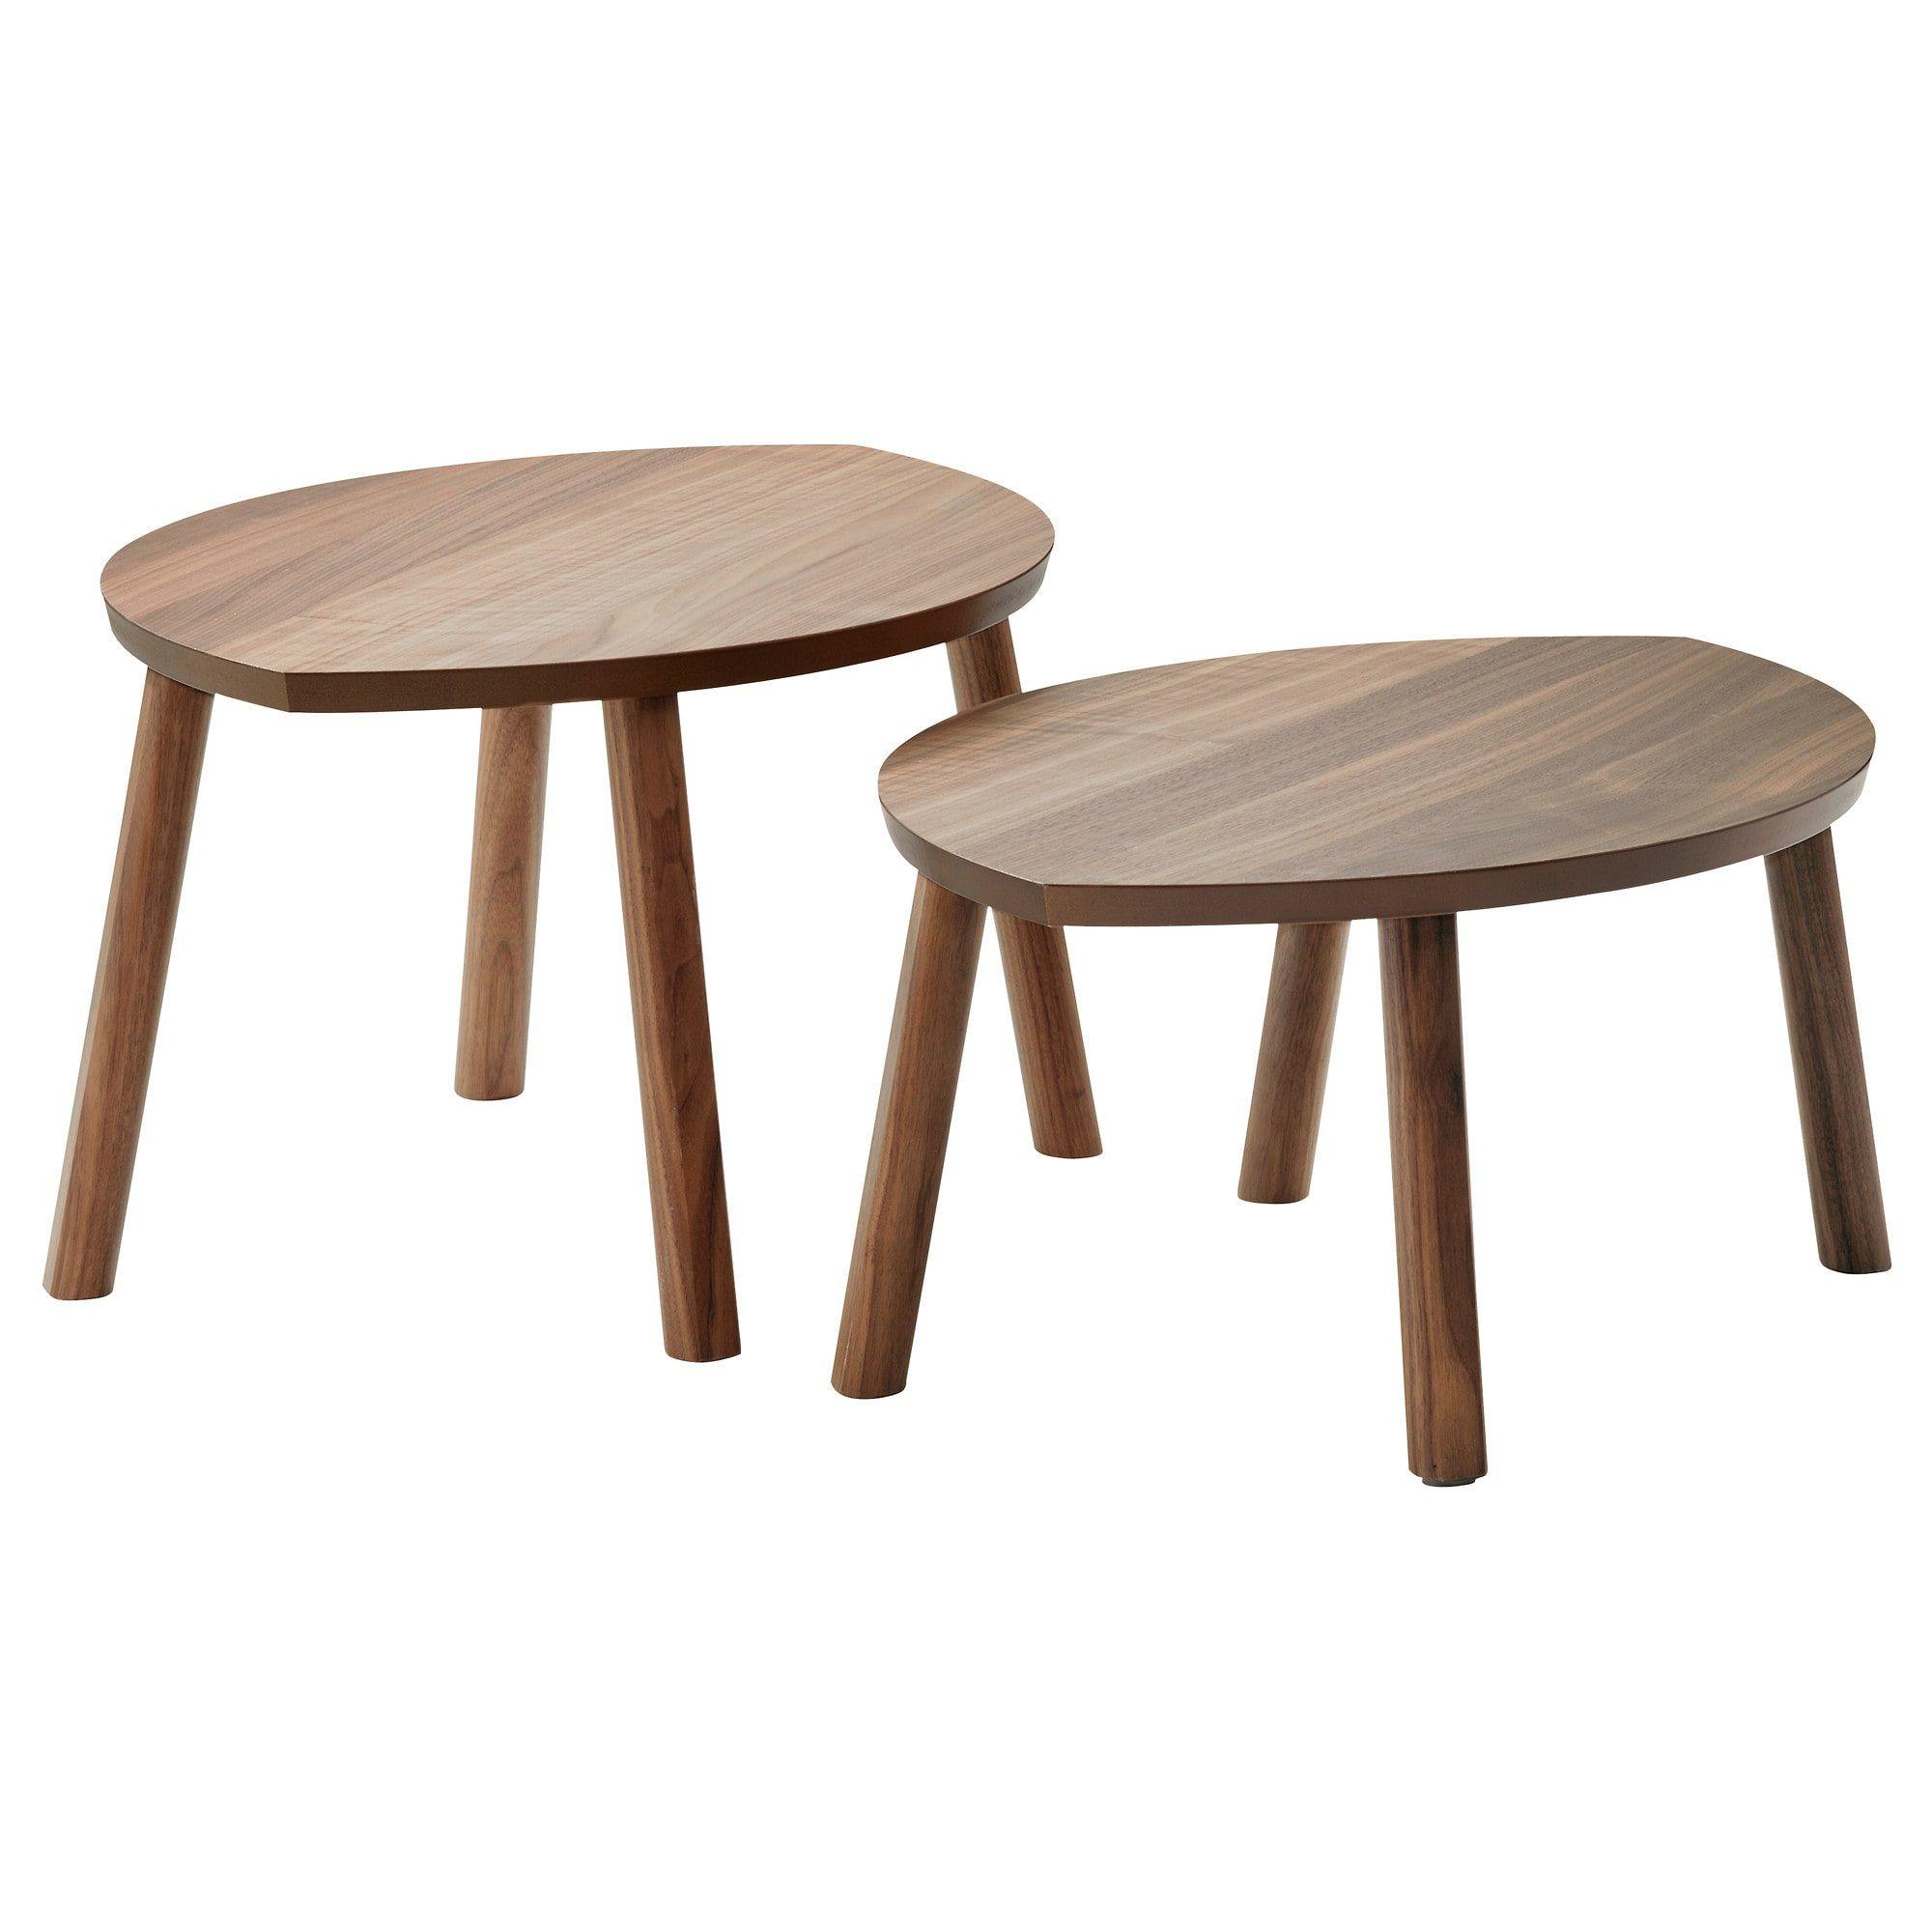 Stockholm Nesting Tables Set Of 2 Walnut Veneer Ikea Ikea Coffee Table Ikea Stockholm Nesting Tables [ 2000 x 2000 Pixel ]